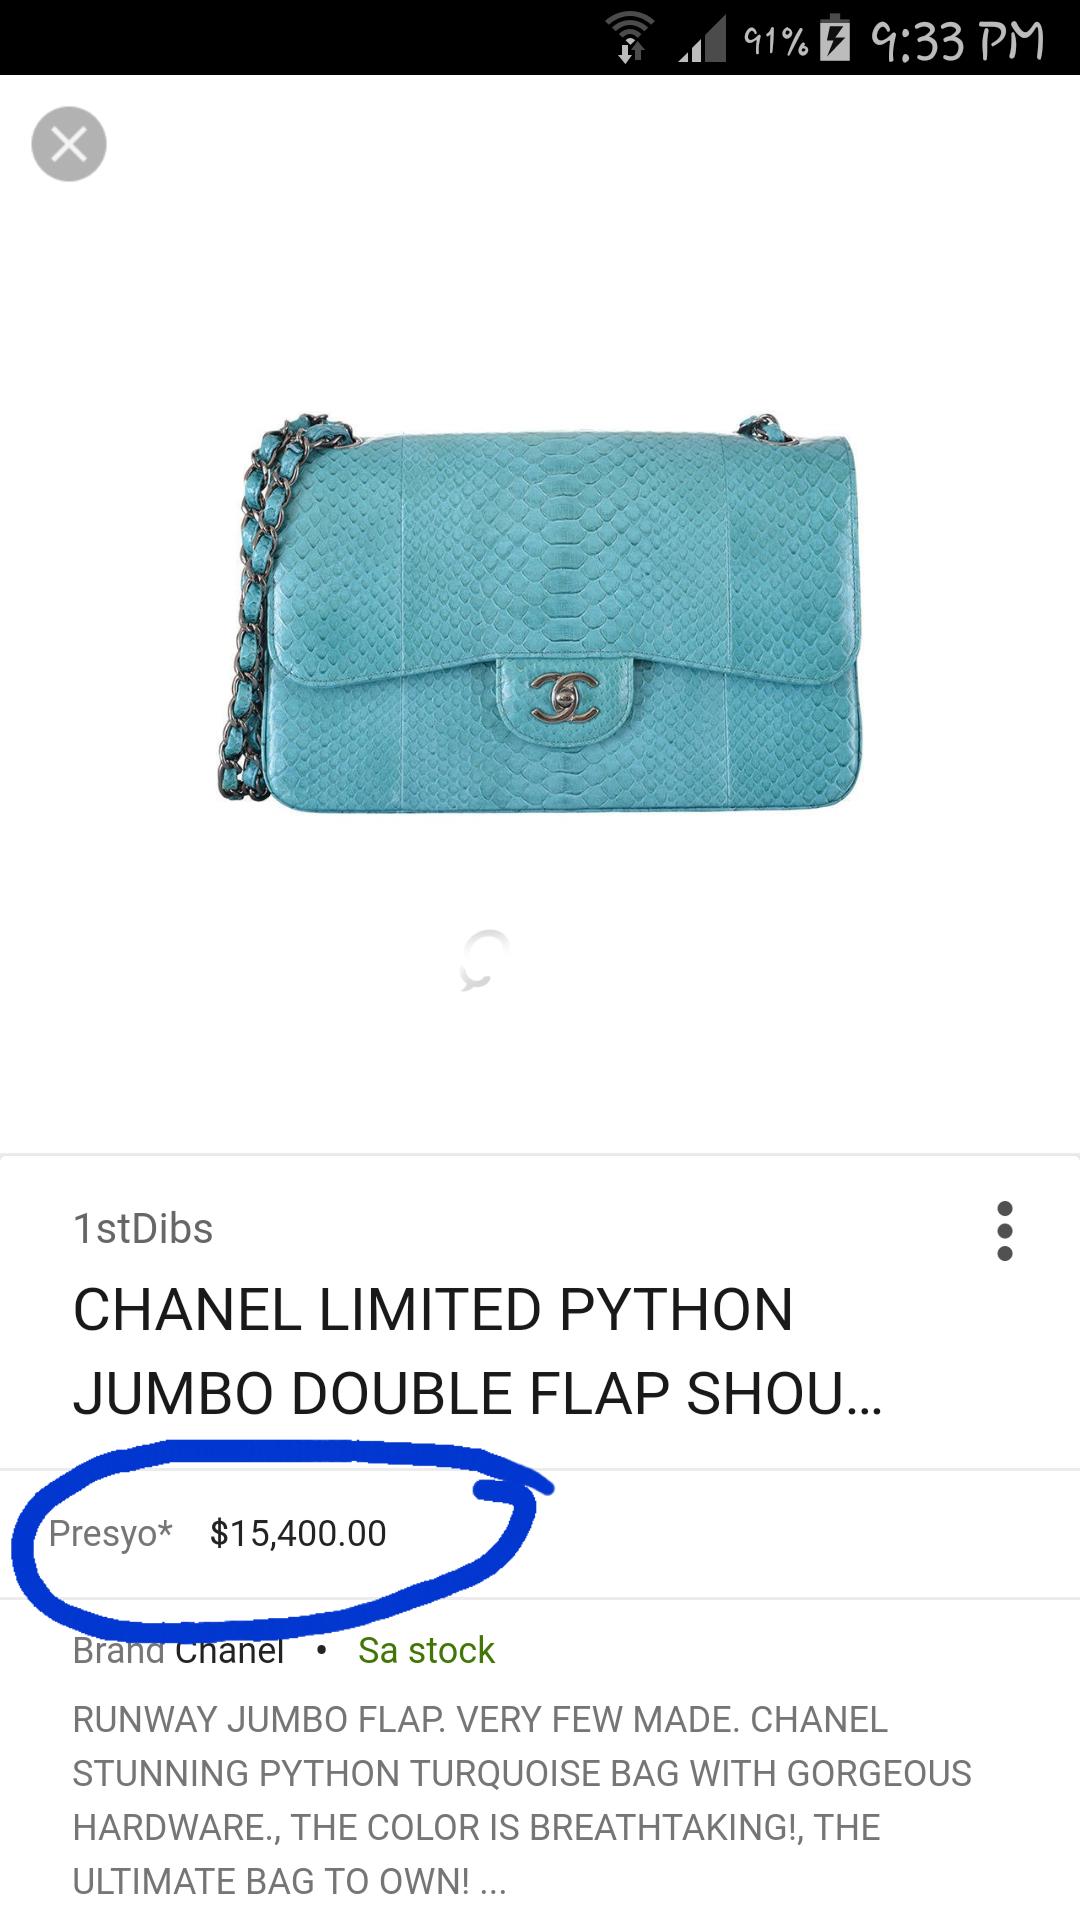 18b21fdf9c62 NEW Most Limited Chanel Python Classic Double Flap Bag Jumbo | Qatar ...